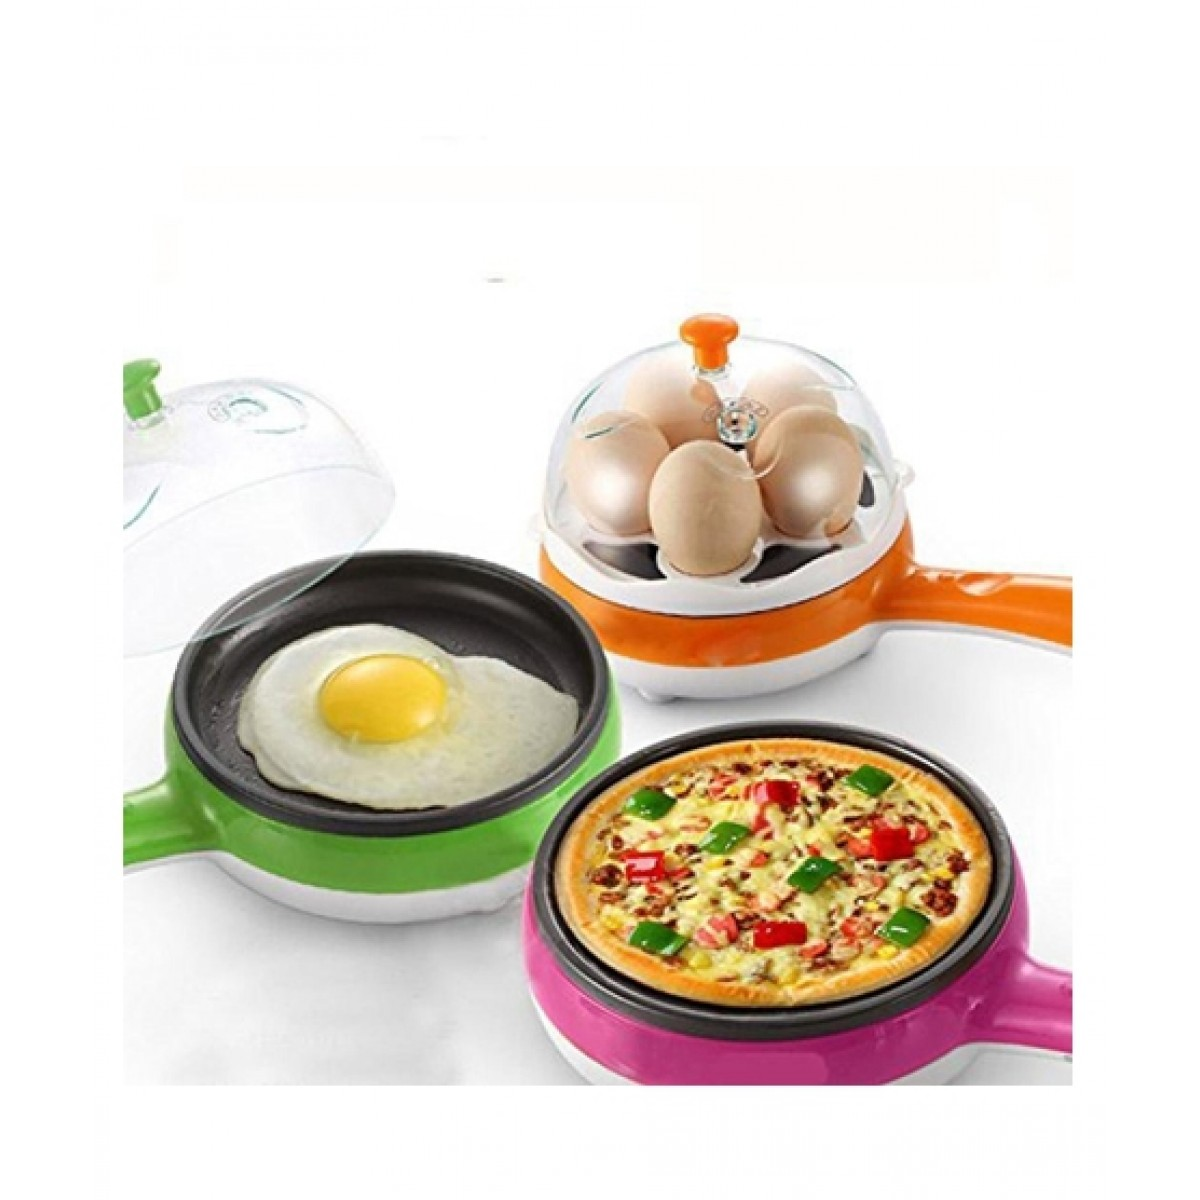 Cool Boy Mart Versatile Frying Pan And Egg Boiler